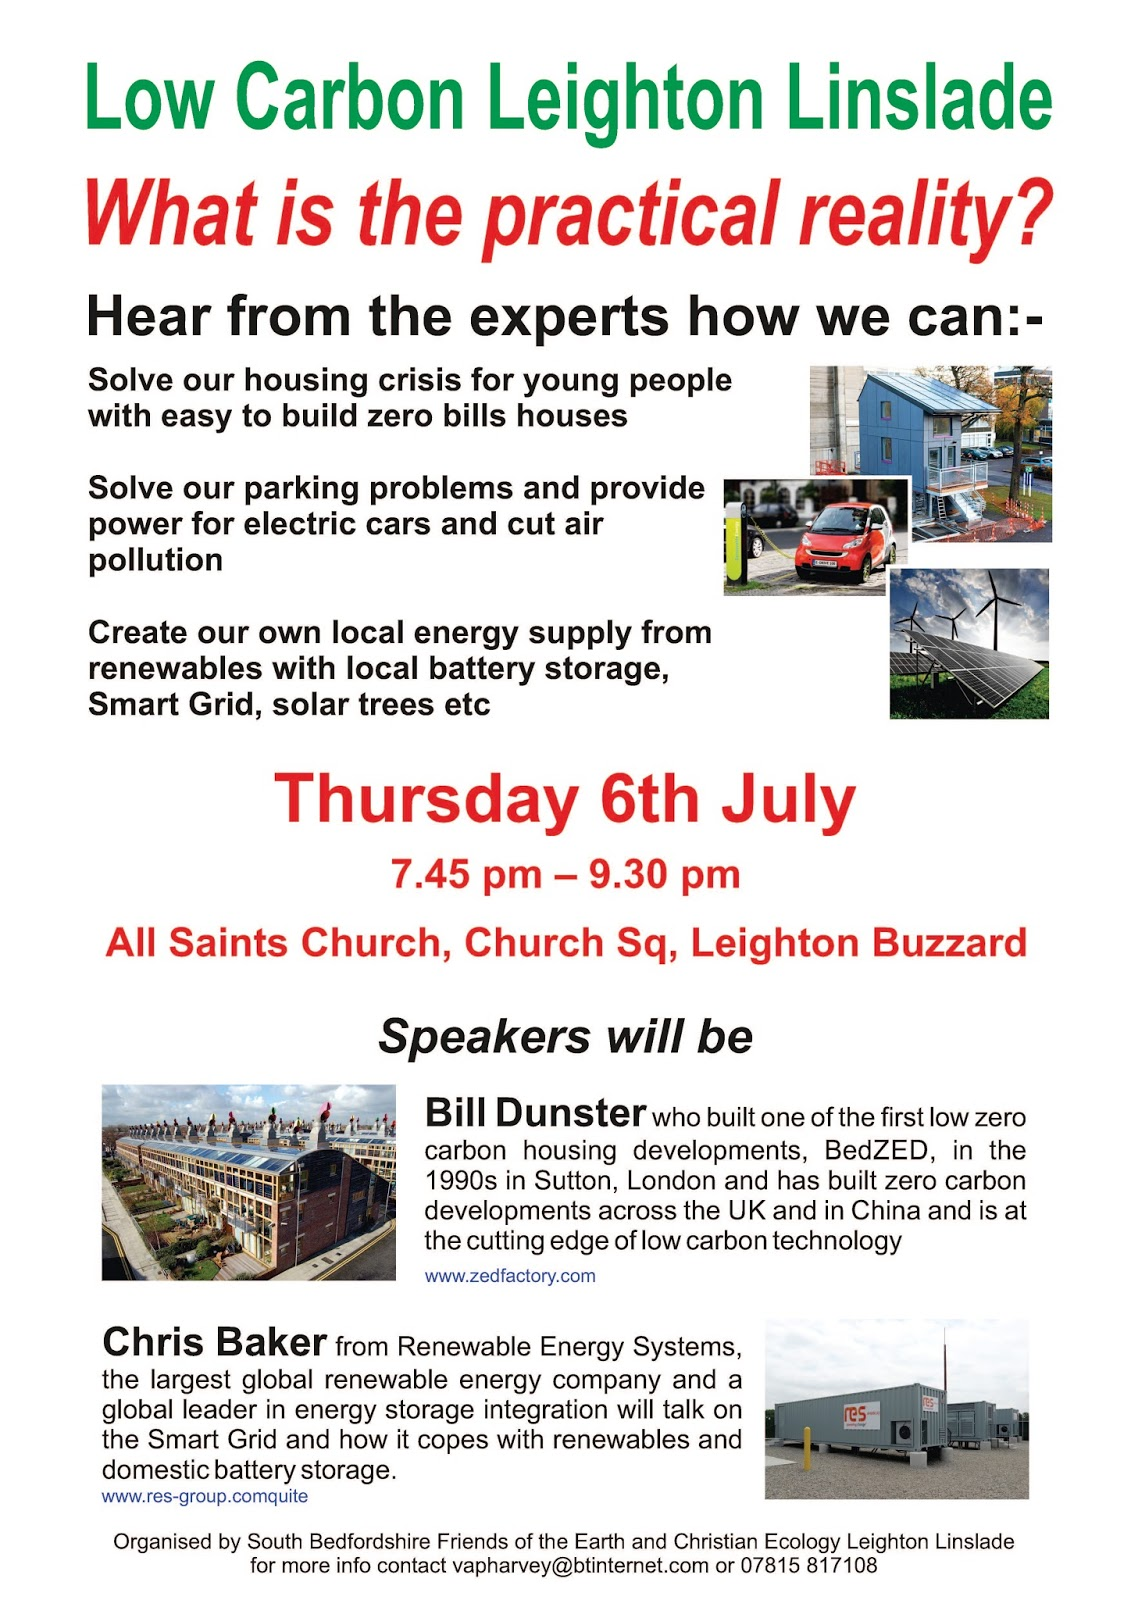 Transition Town Milton Keynes: Low Carbon Leighton Linslade present